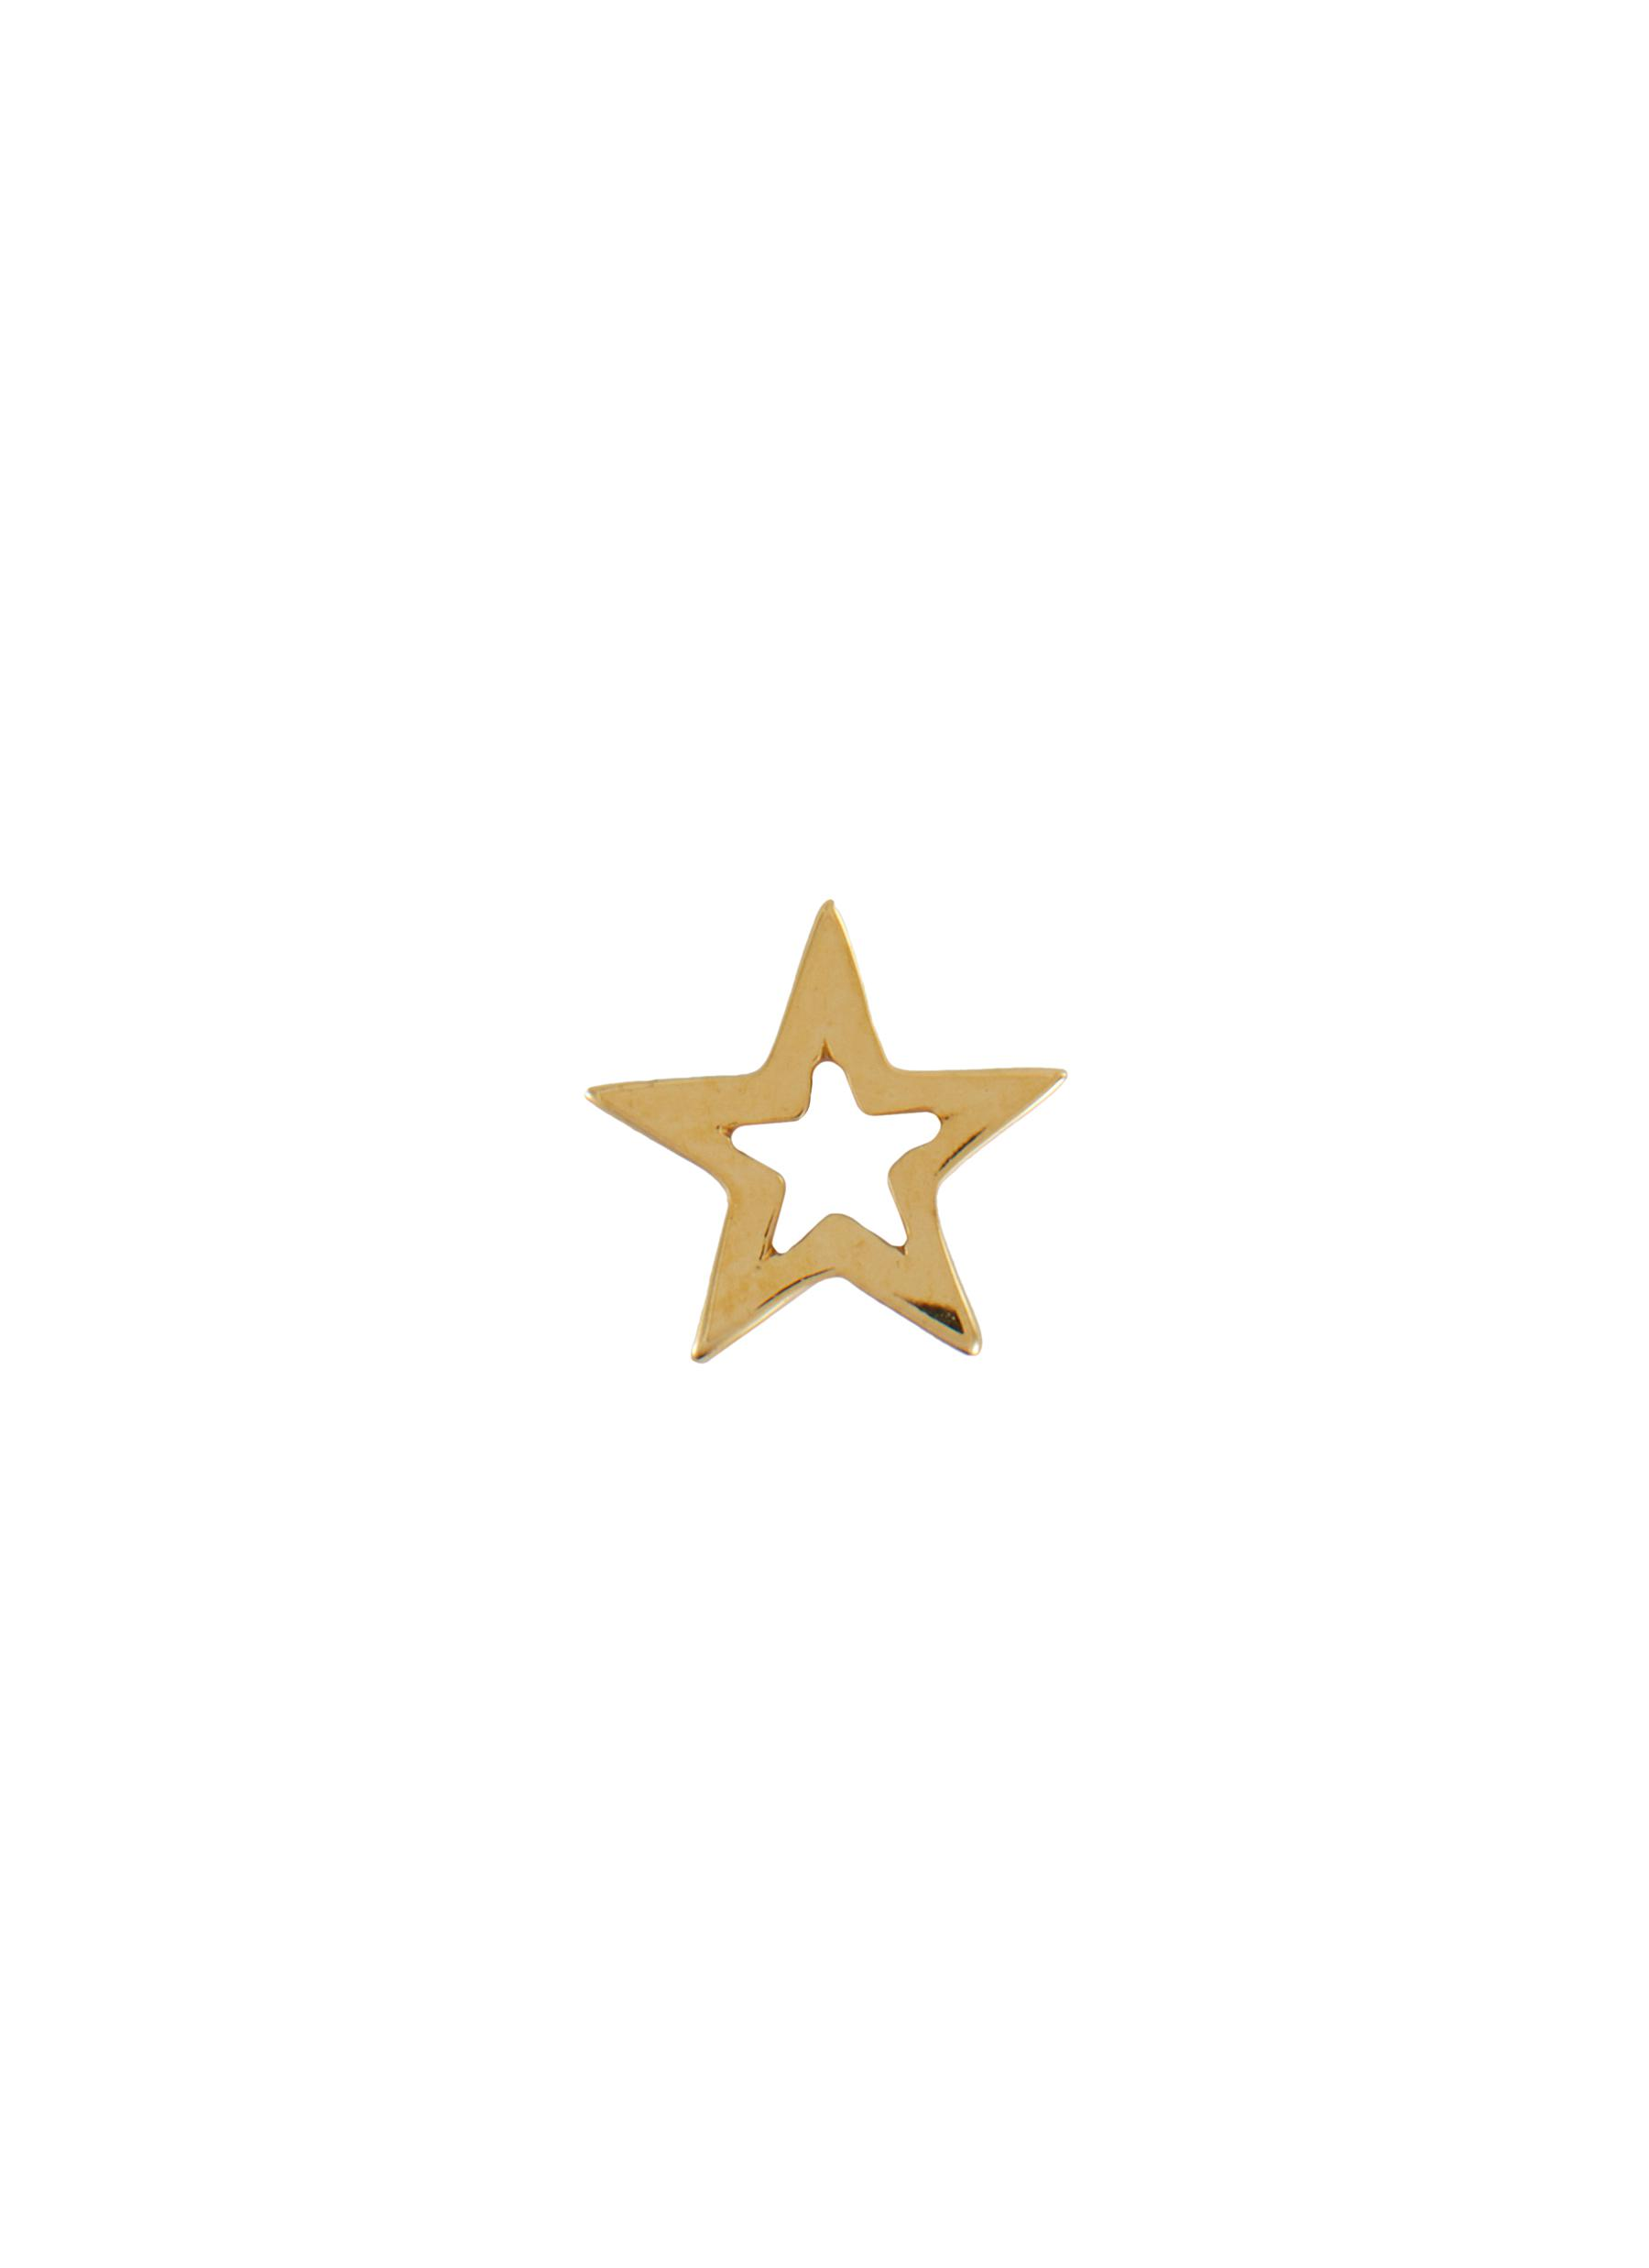 'Star' 18k Gold Charm